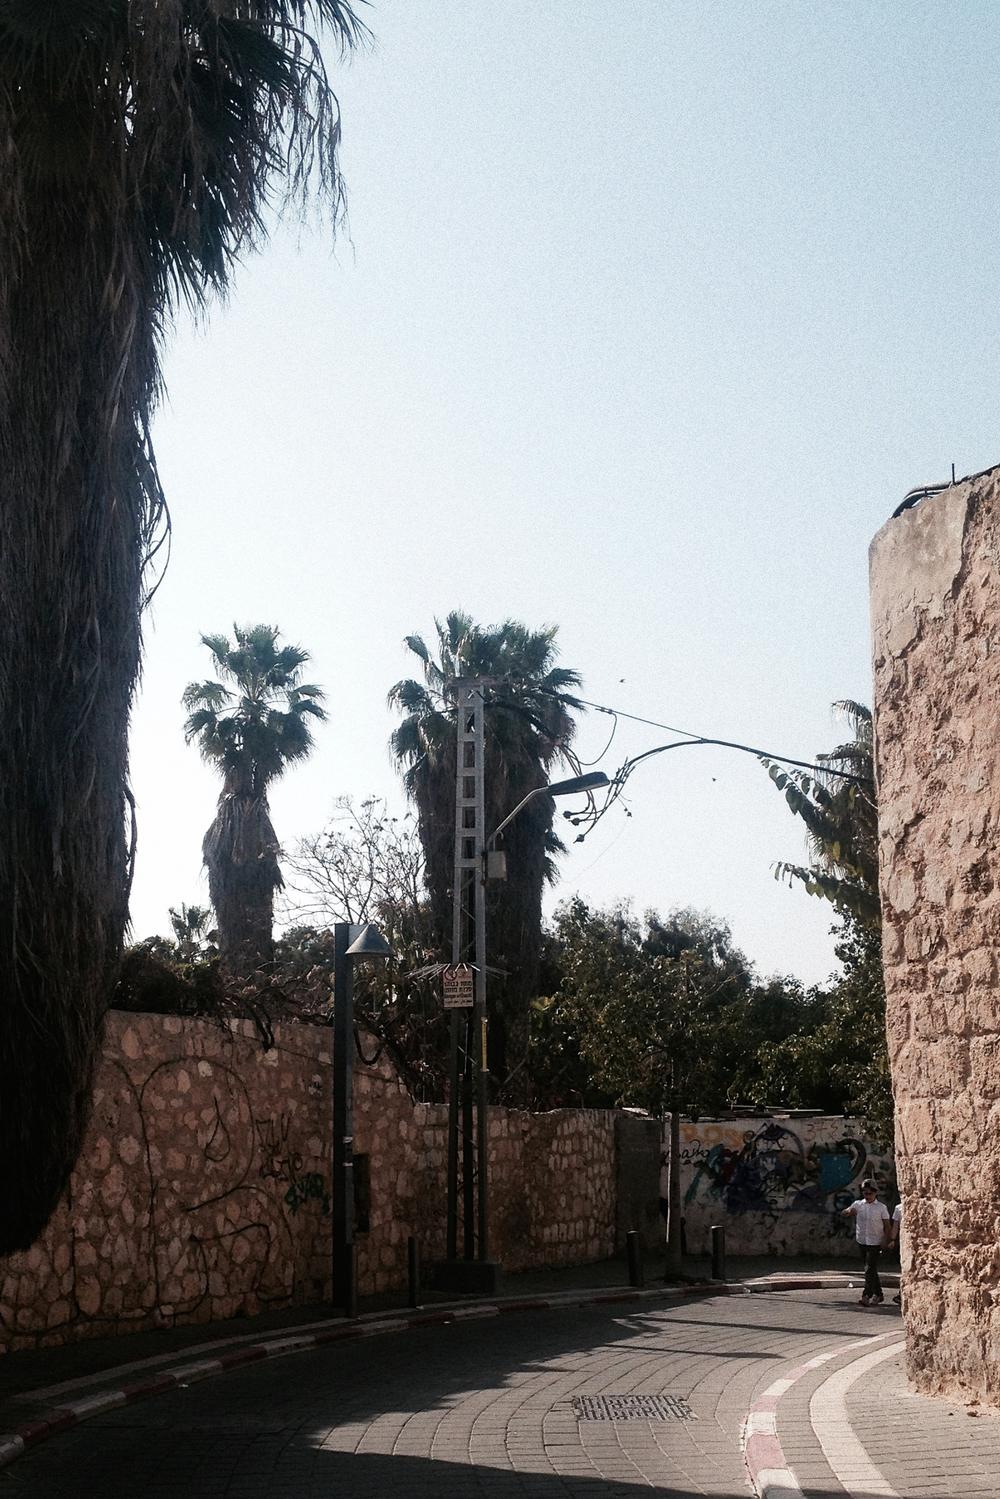 Backstreets_TelAviv_2